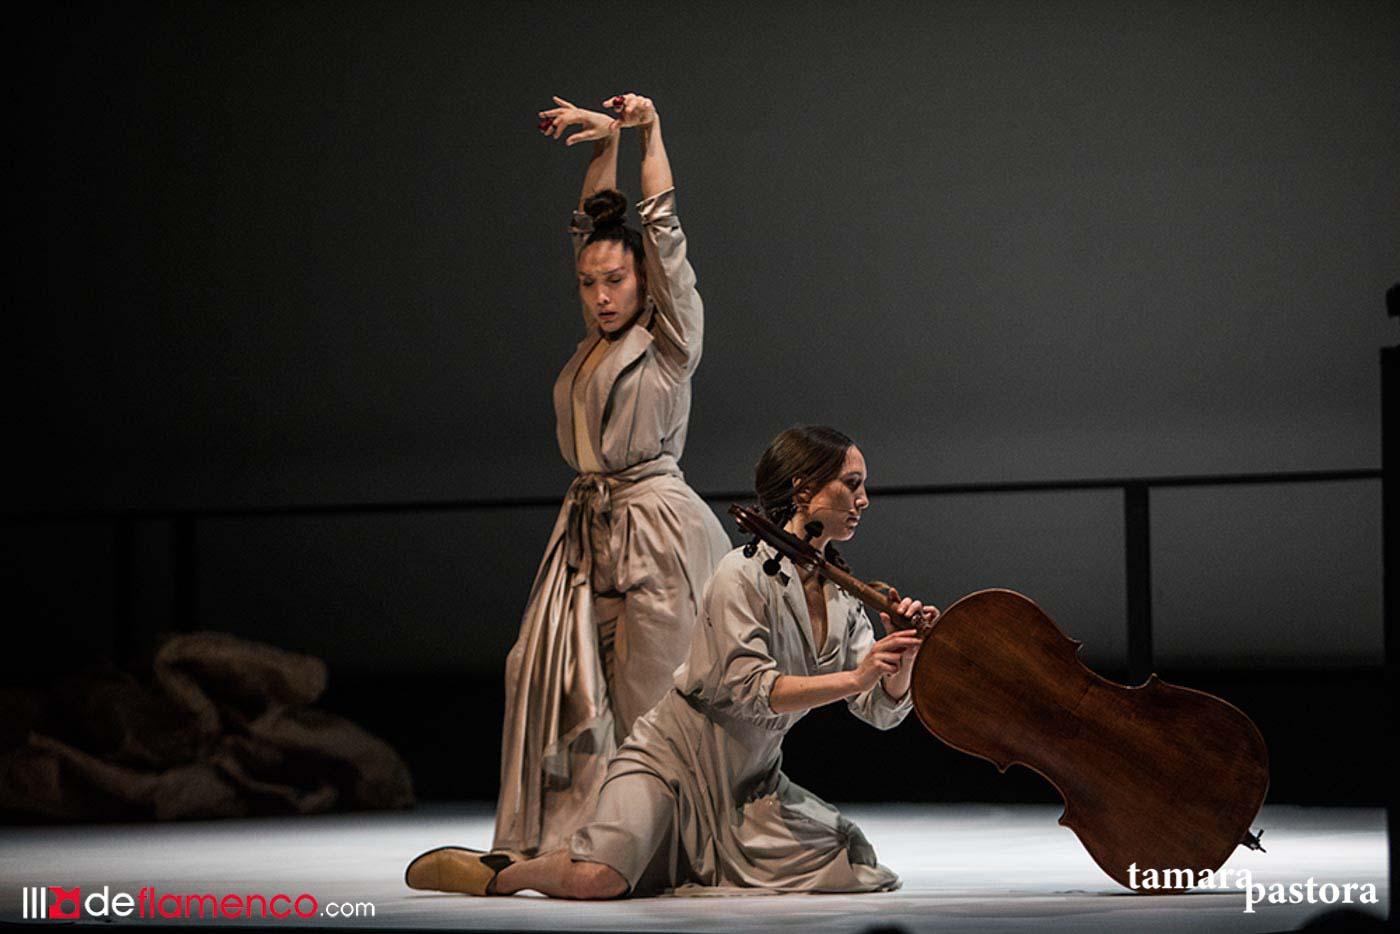 Florencia Oz, Premio Artista Revelación del Festival de Jerez 2021